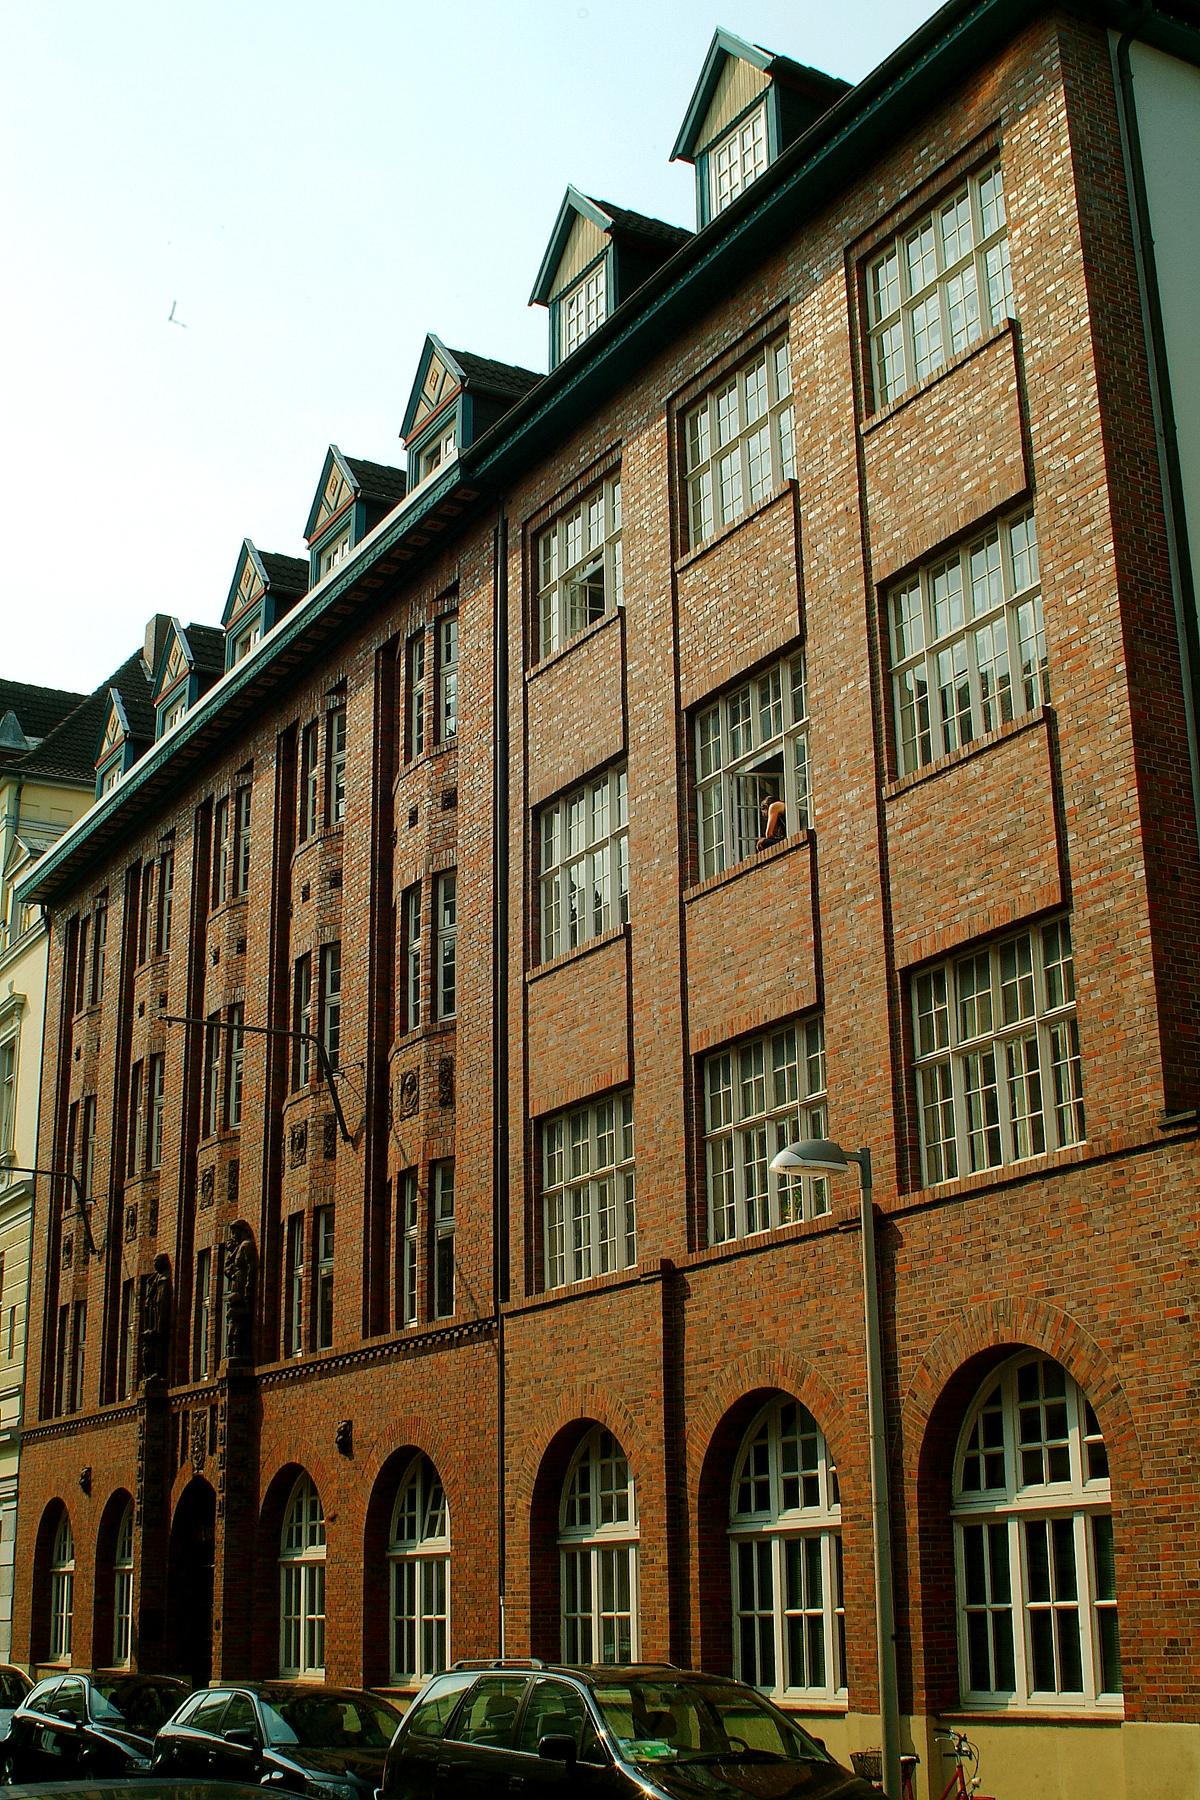 Architekt Hannover file ebhardtstraße 3a hannover lutherhaus diakonie architekt brandes